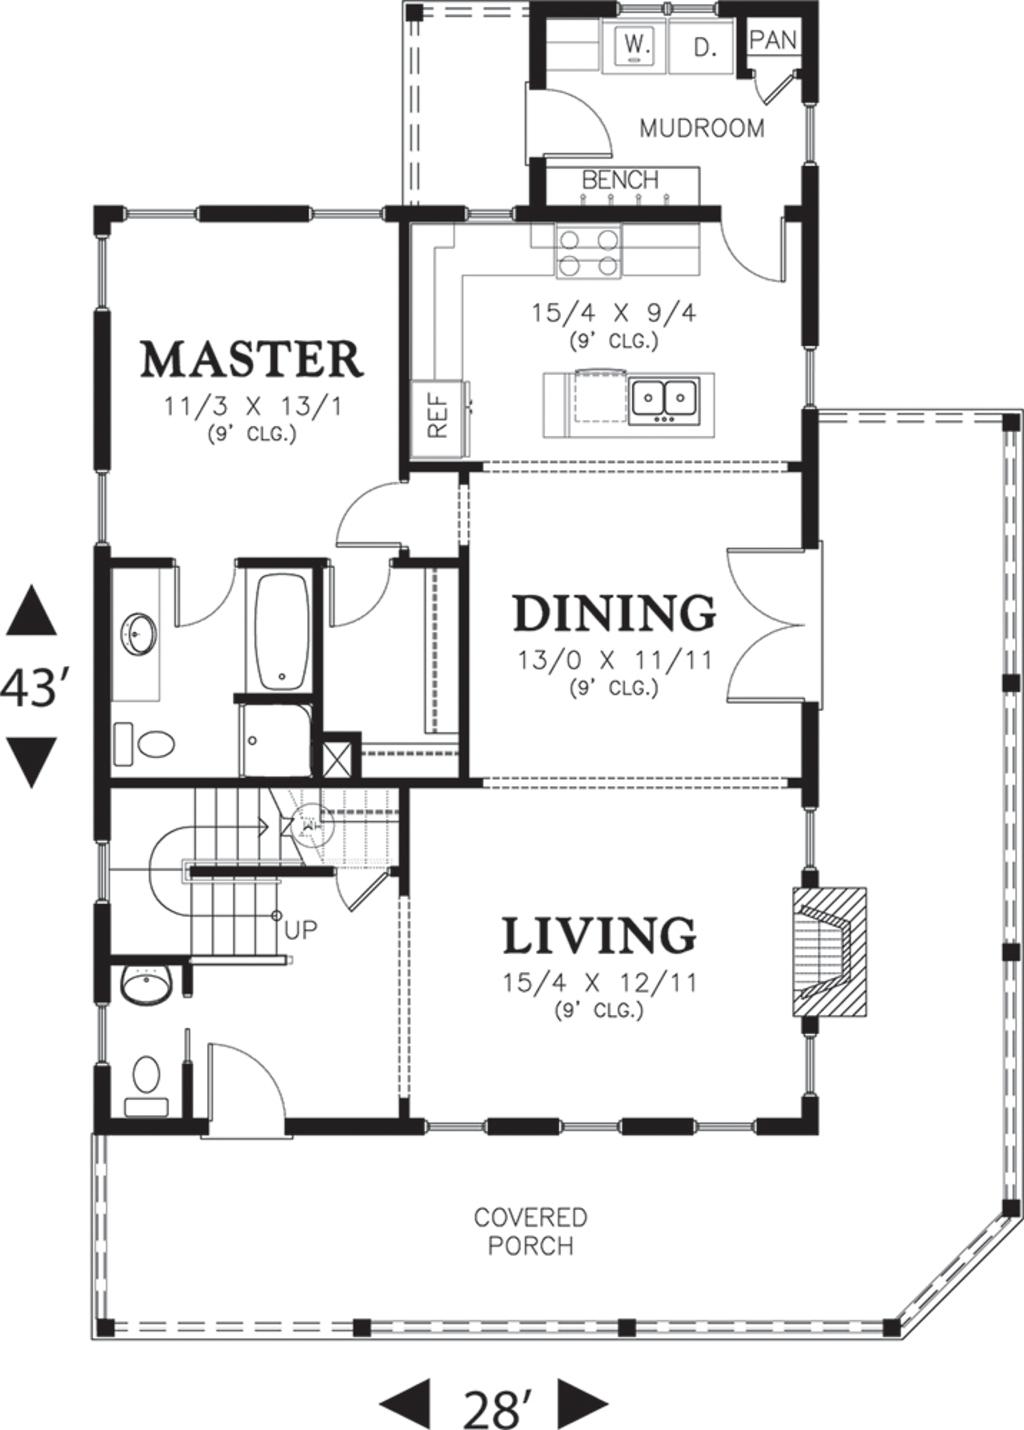 Cottage Style House Plan 3 Beds 2 5 Baths 1915 Sq Ft Plan 48 572 Houseplans Com